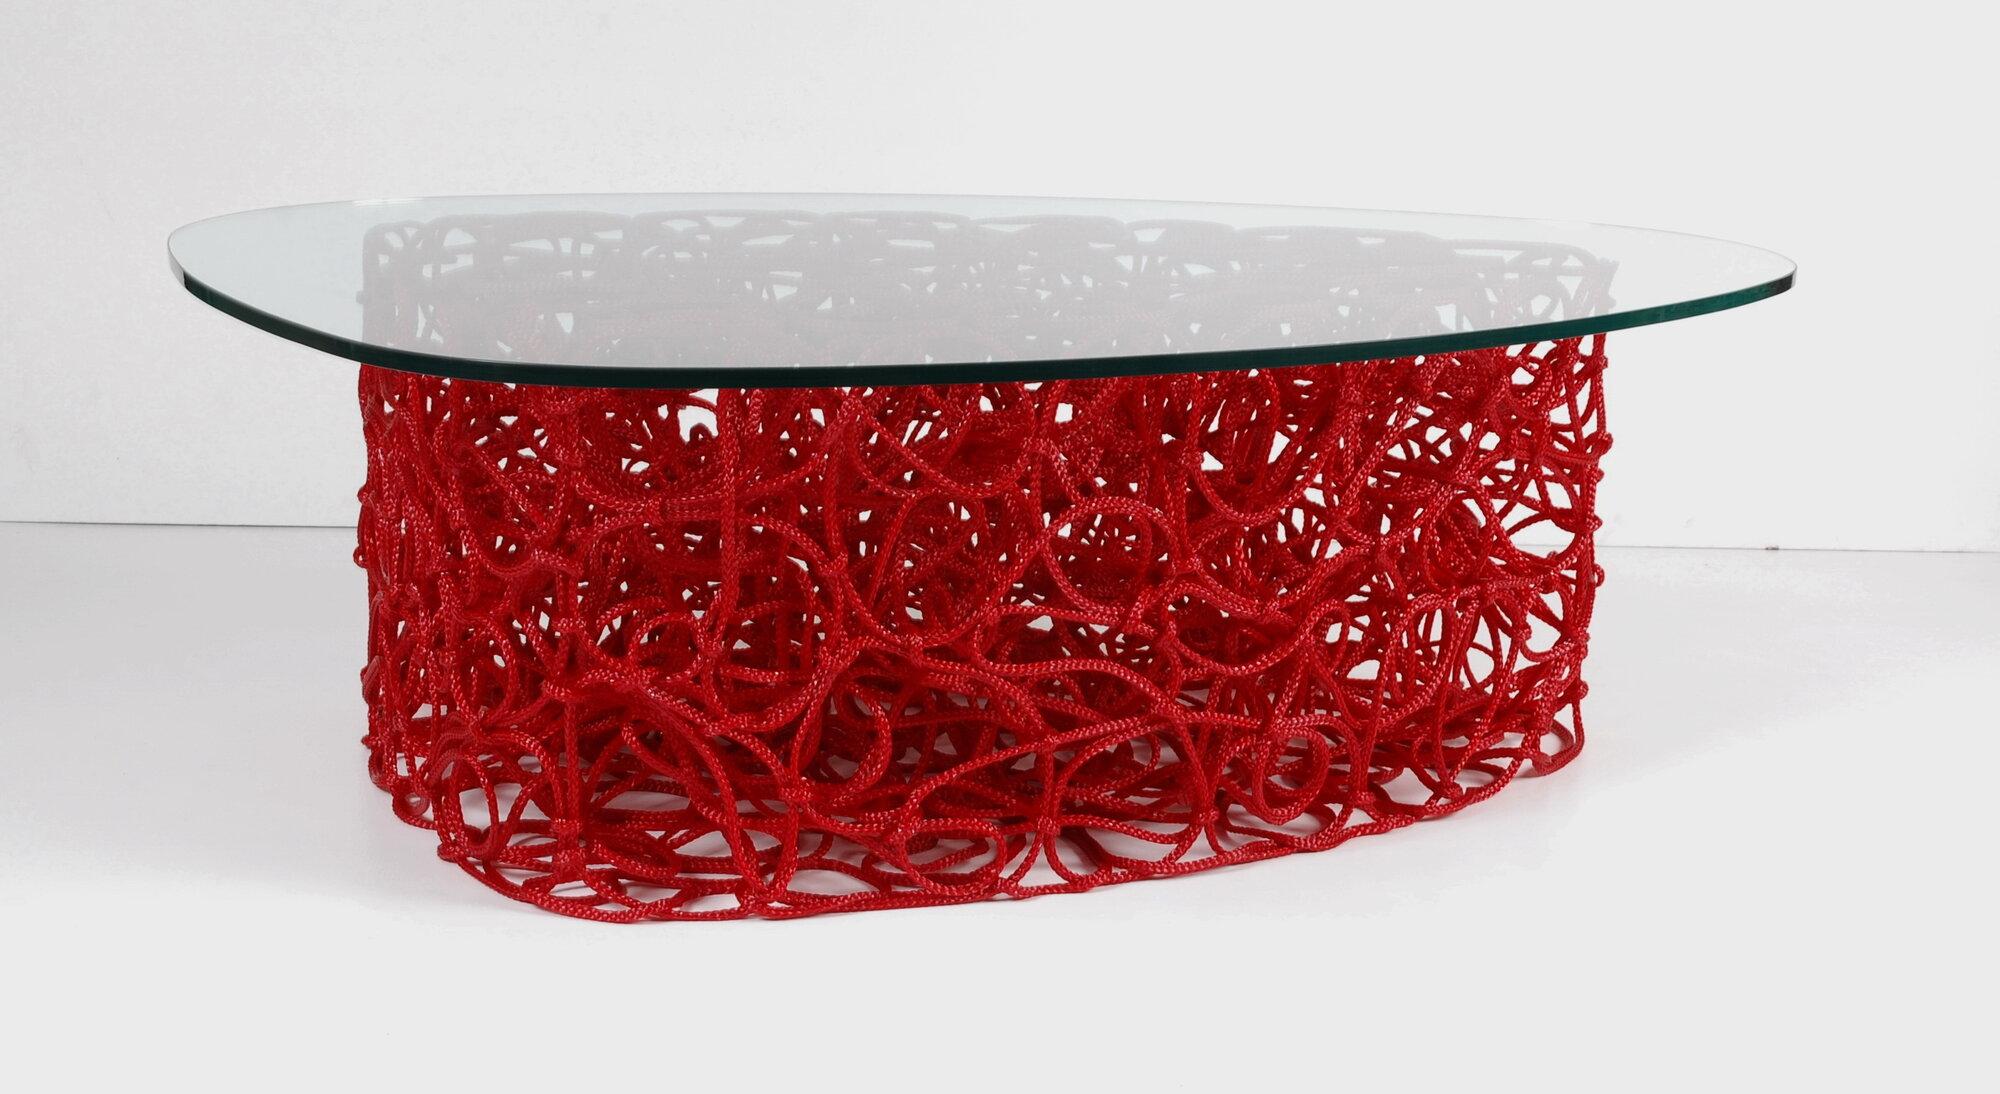 Knoop, freeform rope coffee table in red, 2010